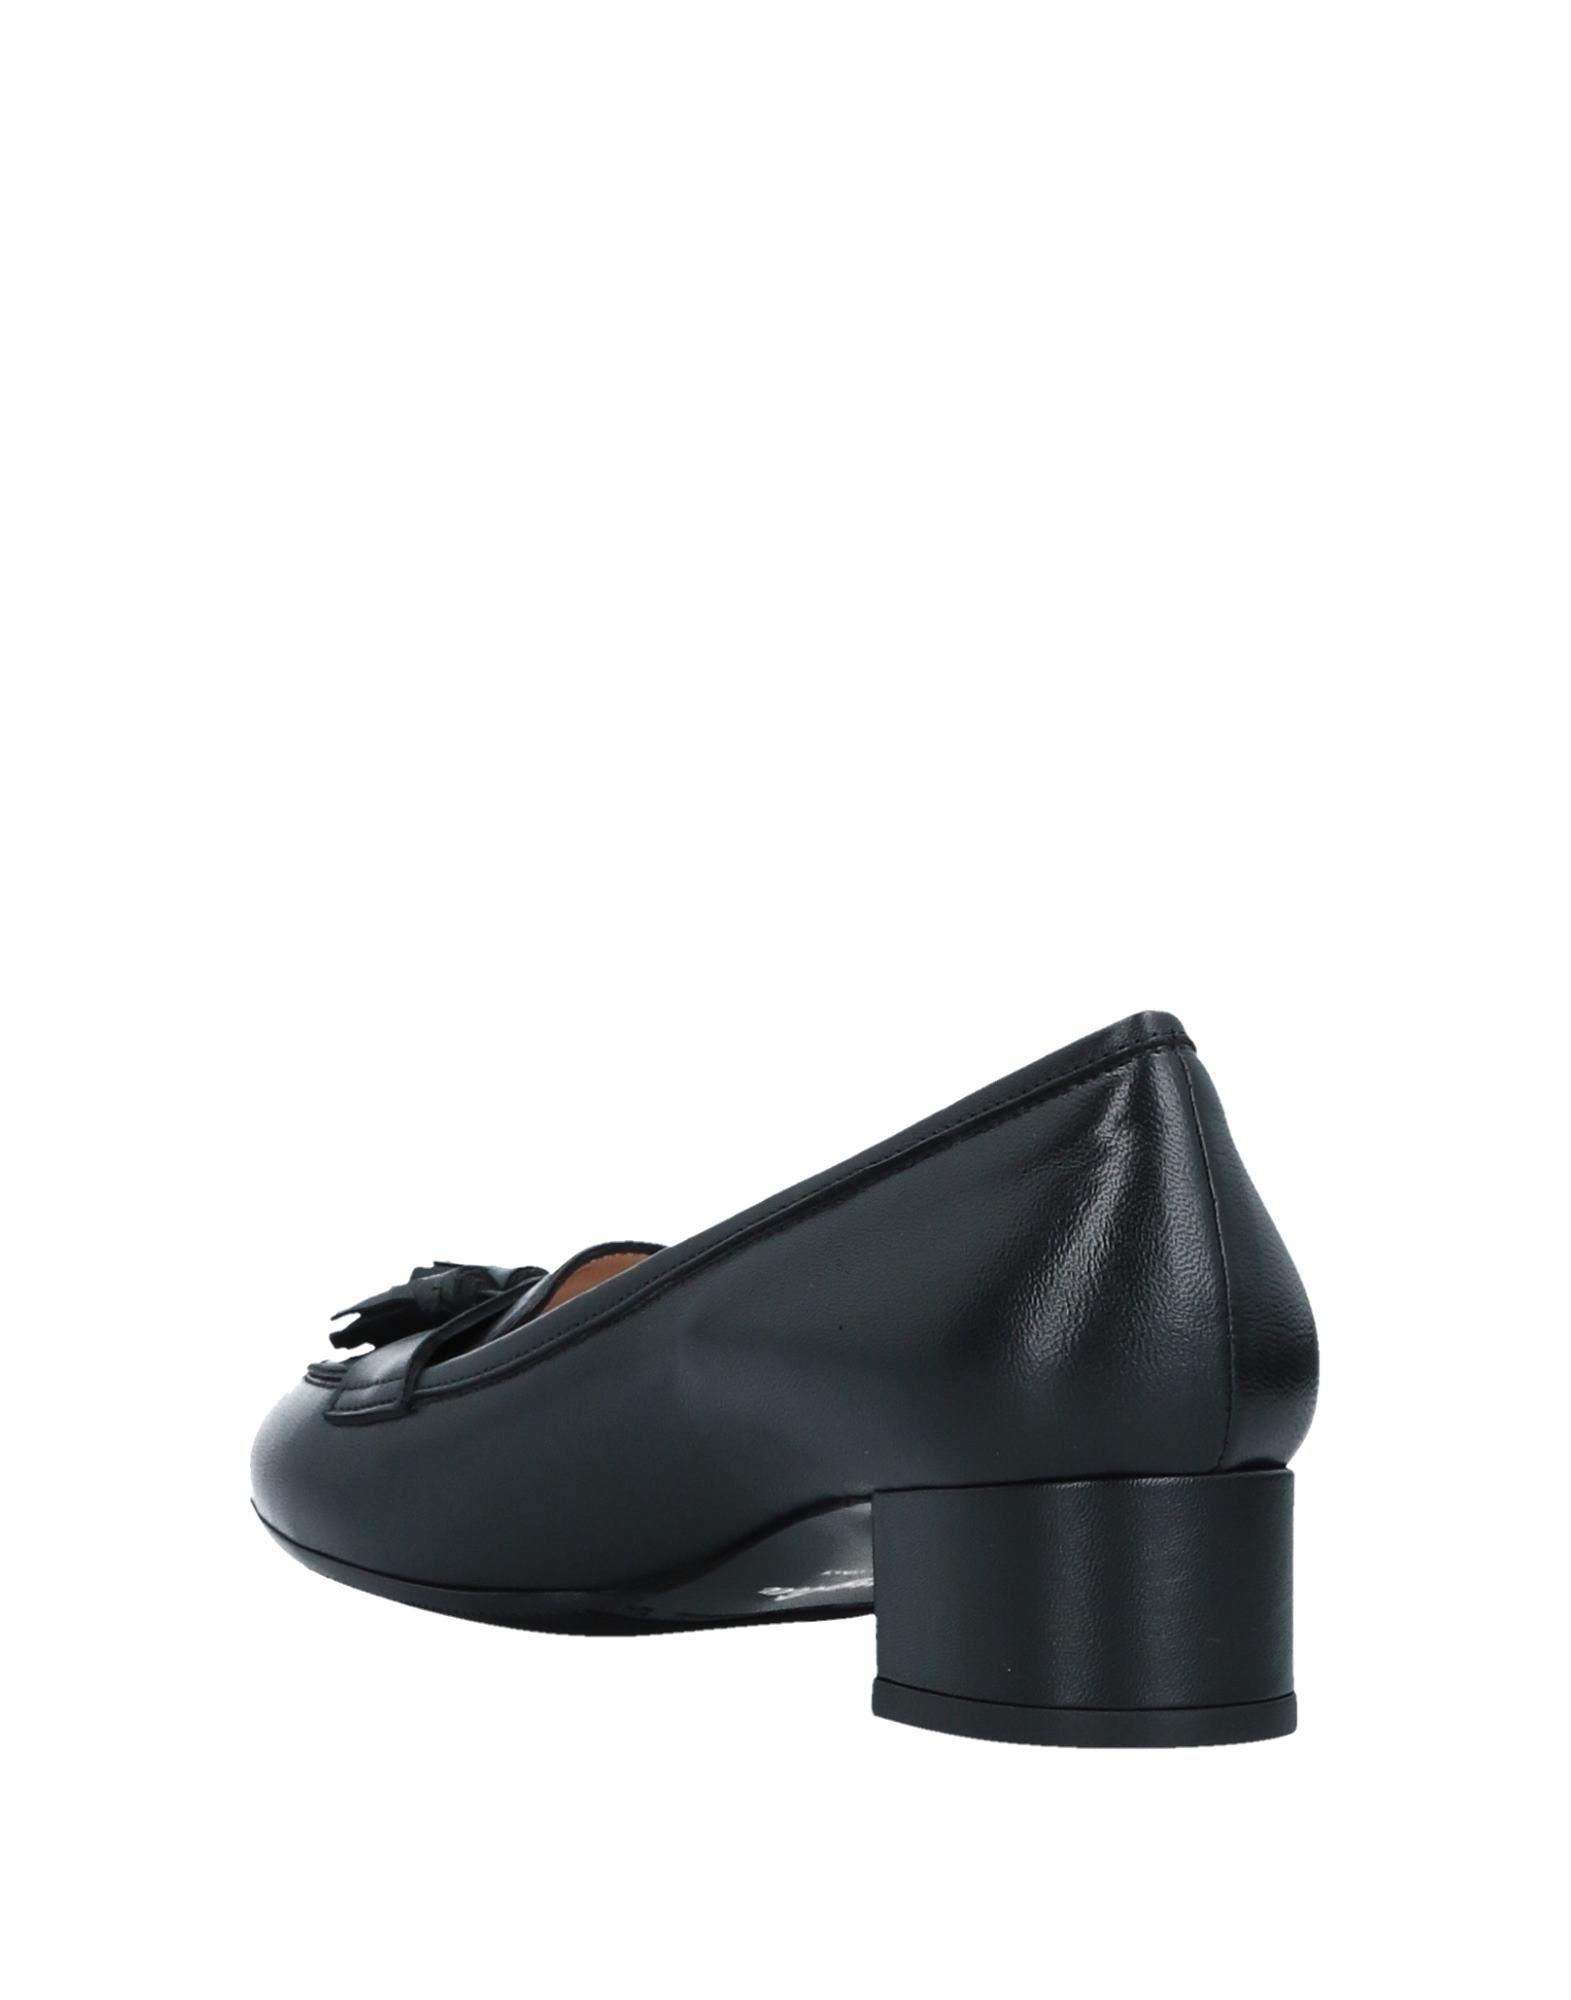 Stilvolle billige Damen Schuhe F.Lli Bruglia Mokassins Damen billige  11518708AW e360e7